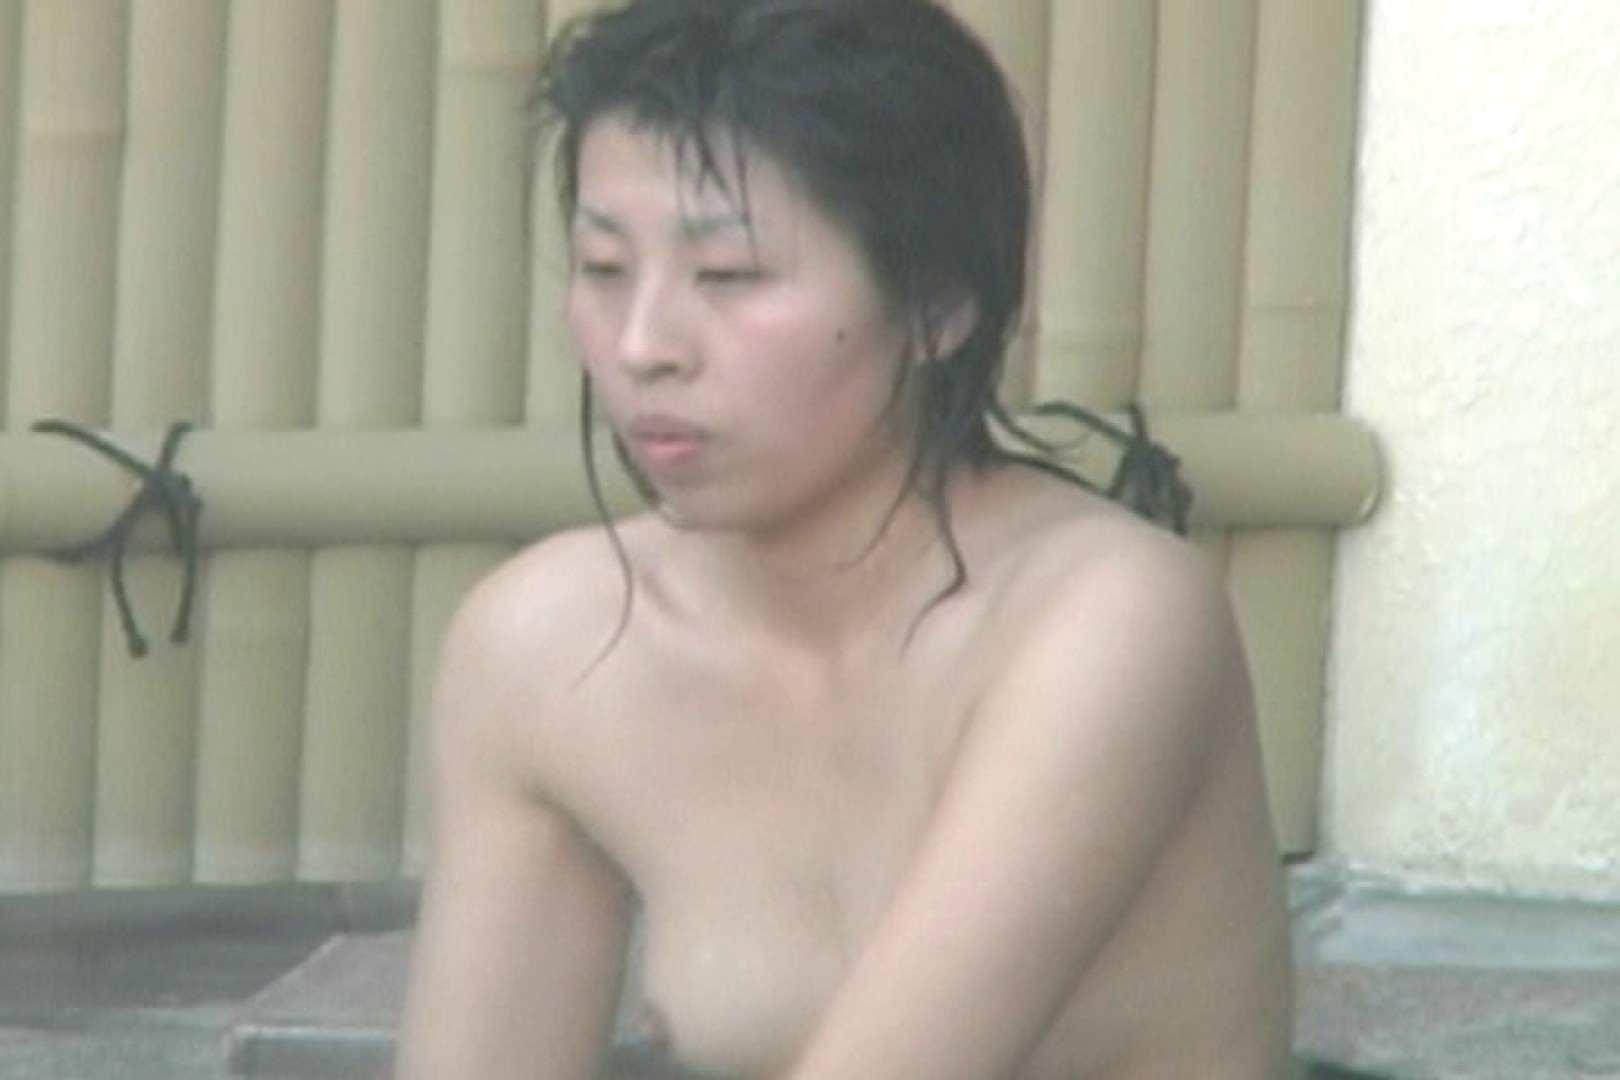 Aquaな露天風呂Vol.589 盗撮 | HなOL  105pic 80